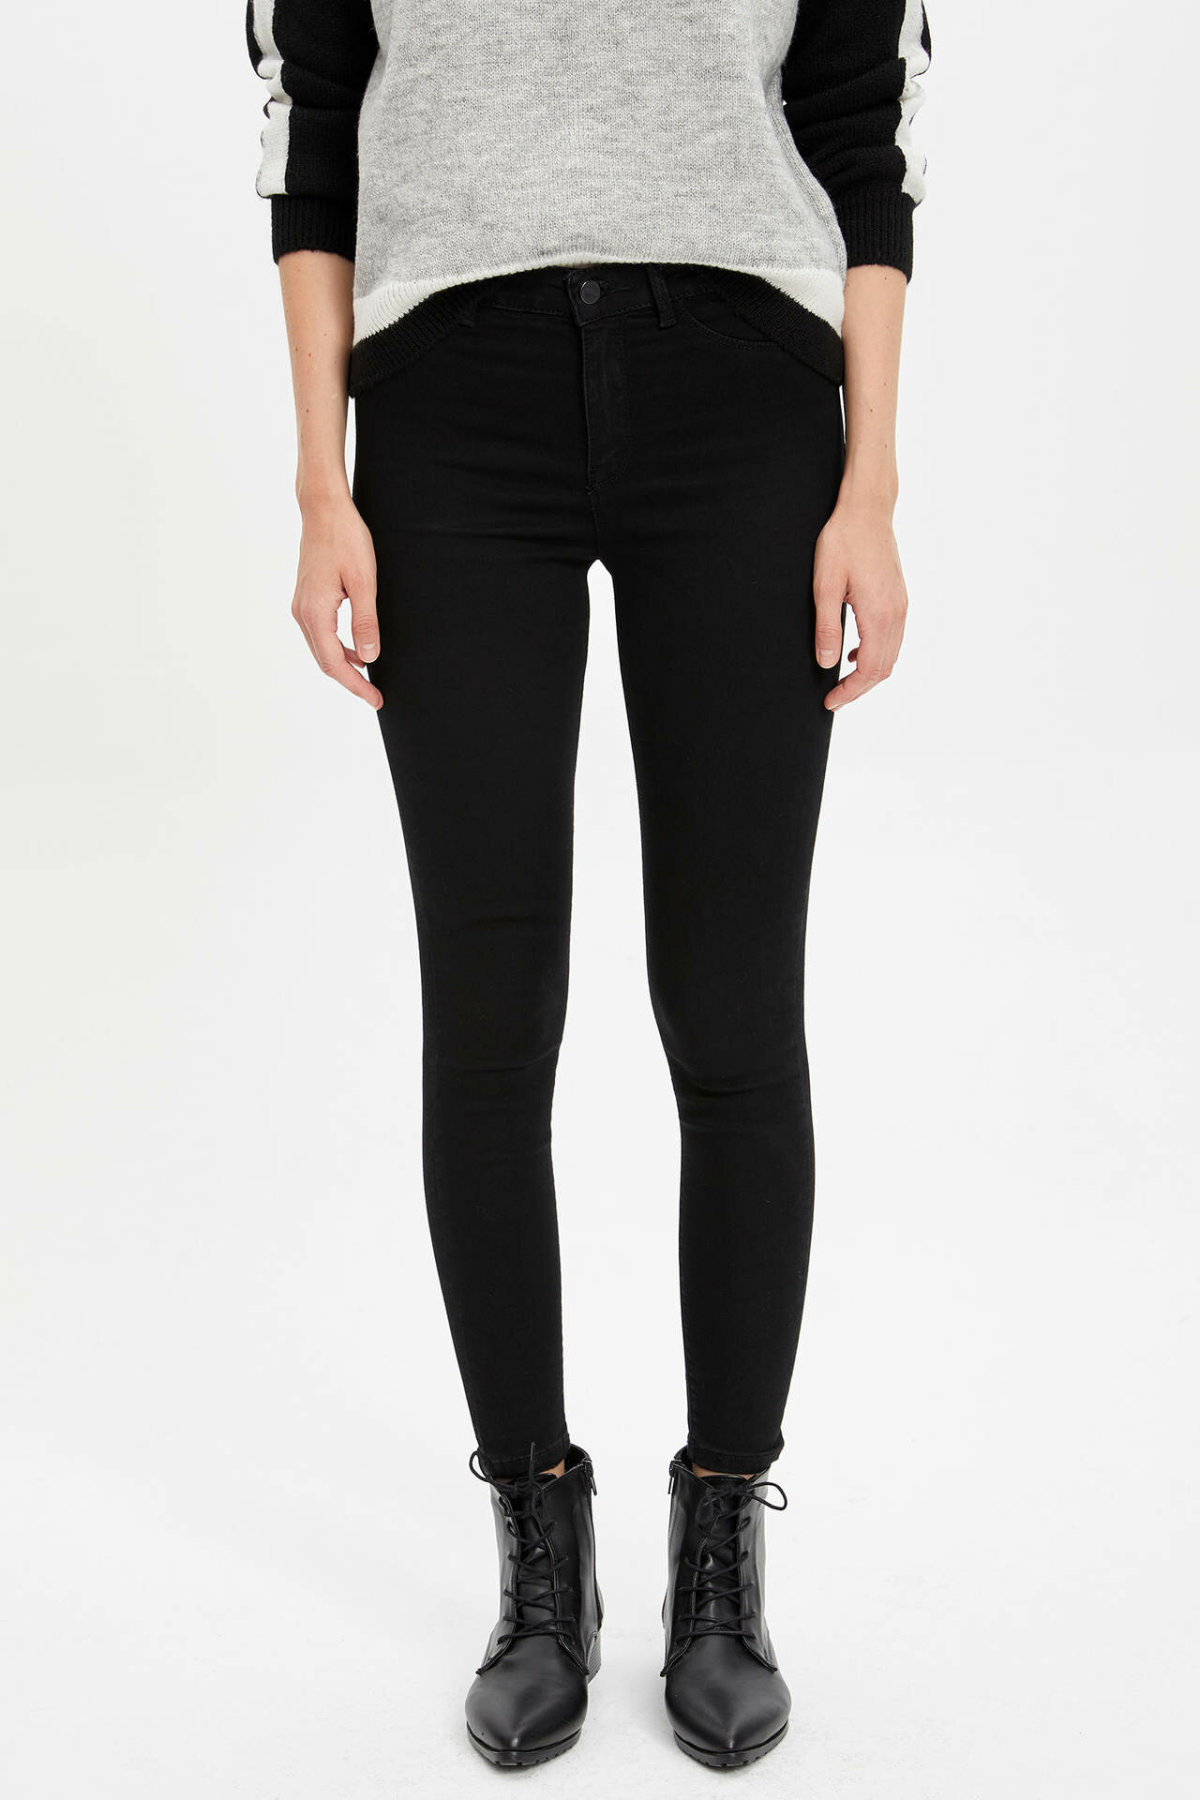 DeFacto Women Fashion Solid Jean Trousers Female High Waist Elastic Denim Female Slim Pencil Crop Pants Lady